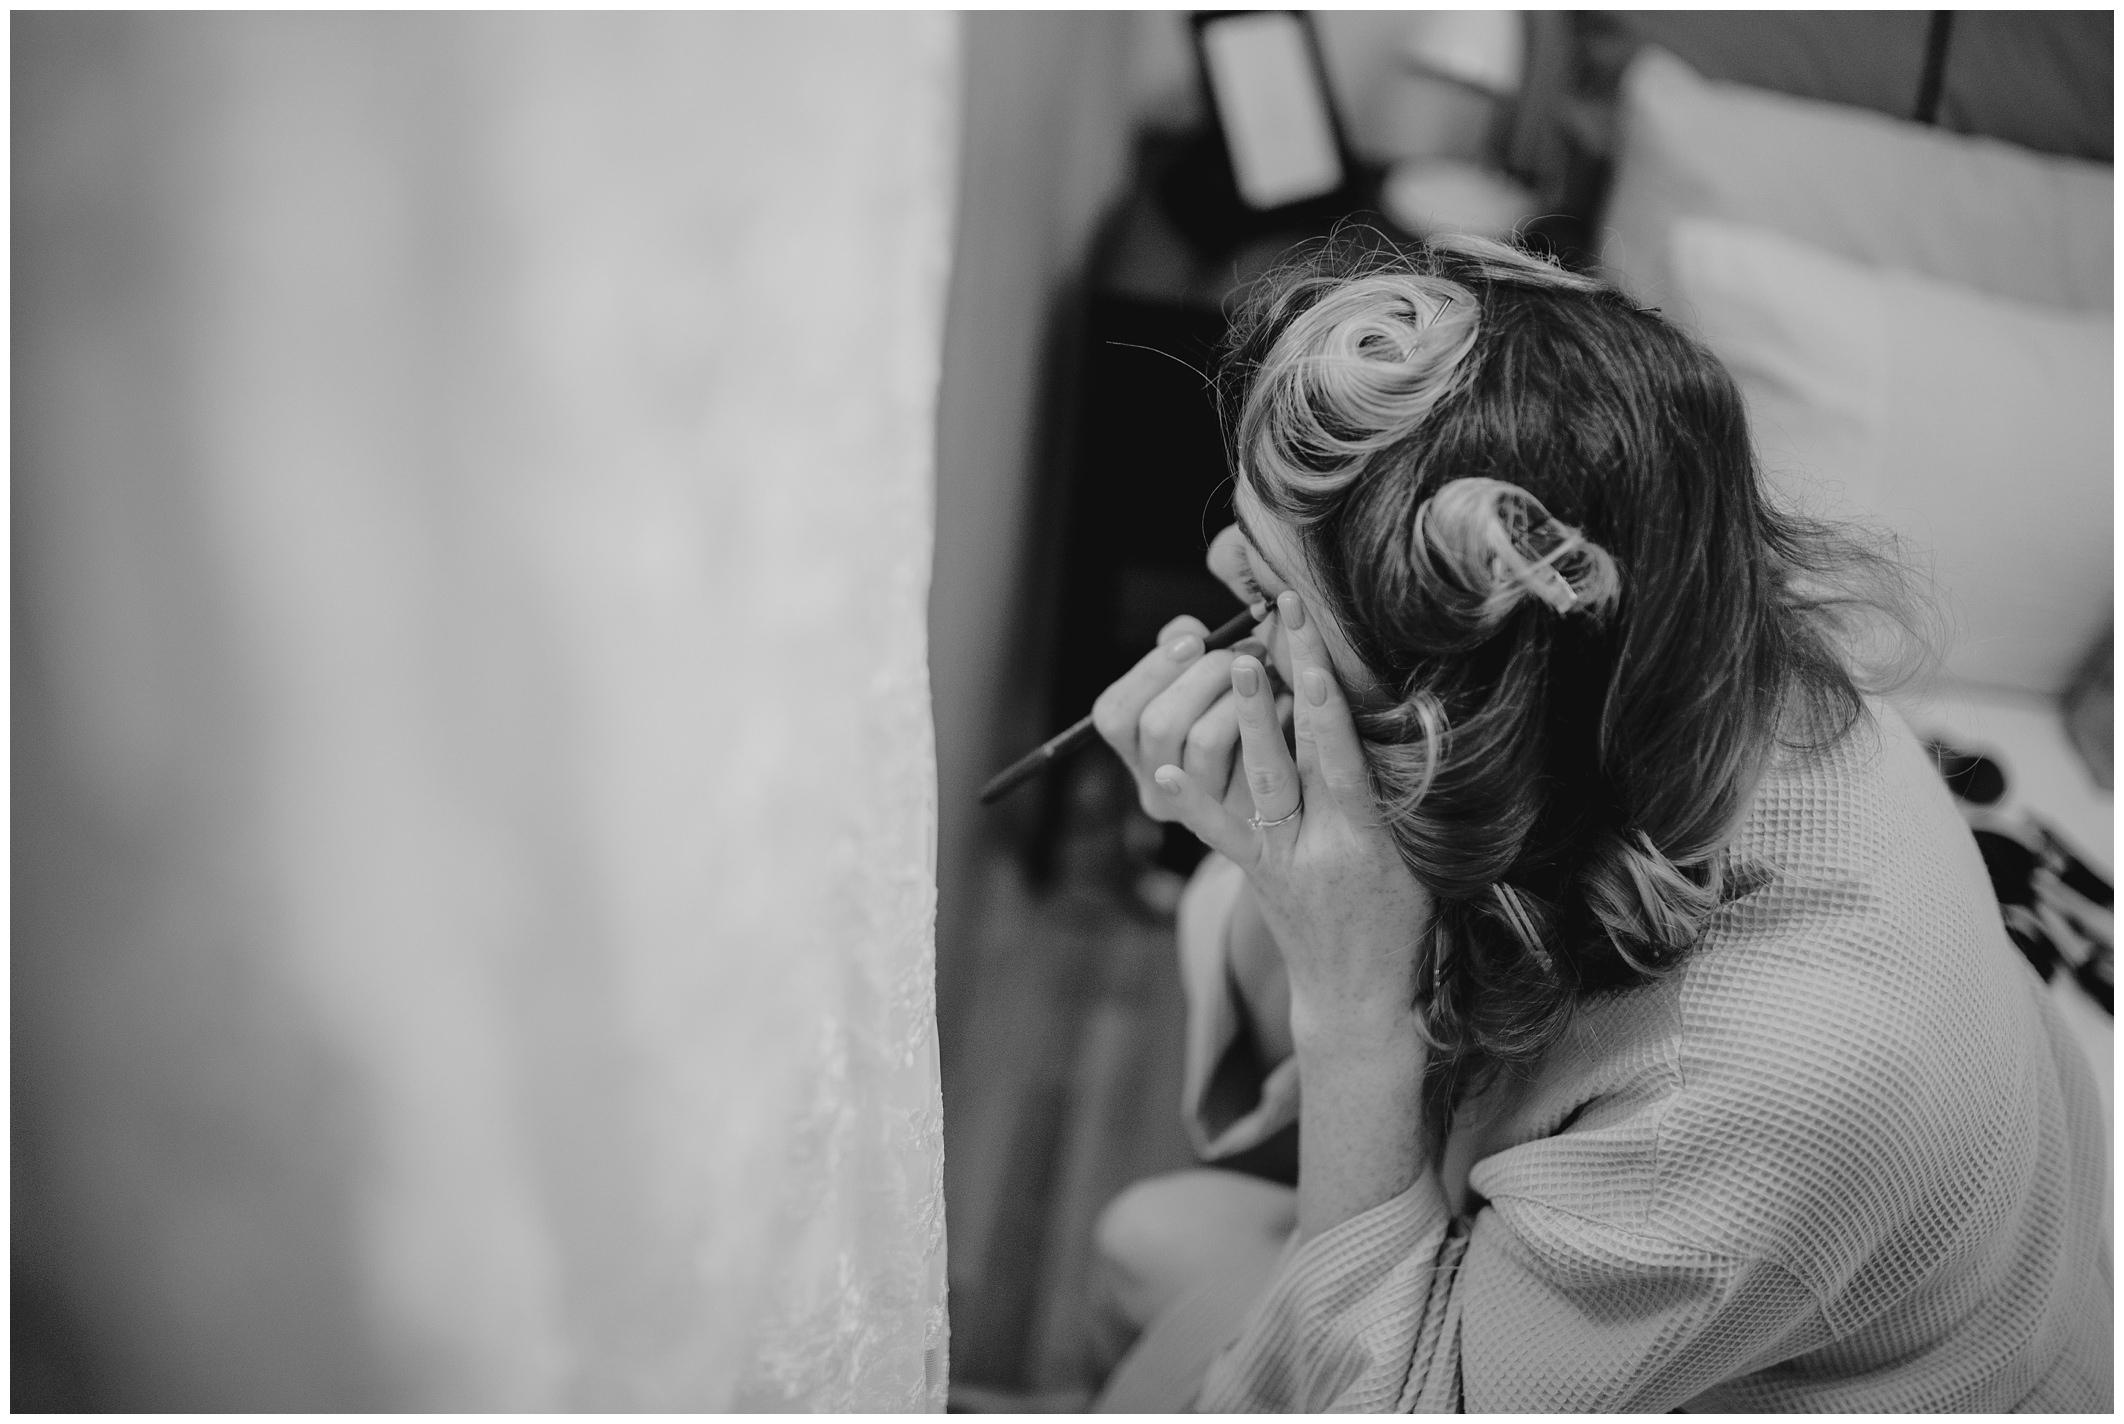 asylum_chapel_peckham_rosendale_wedding_jude_browne_photography_0009.jpg